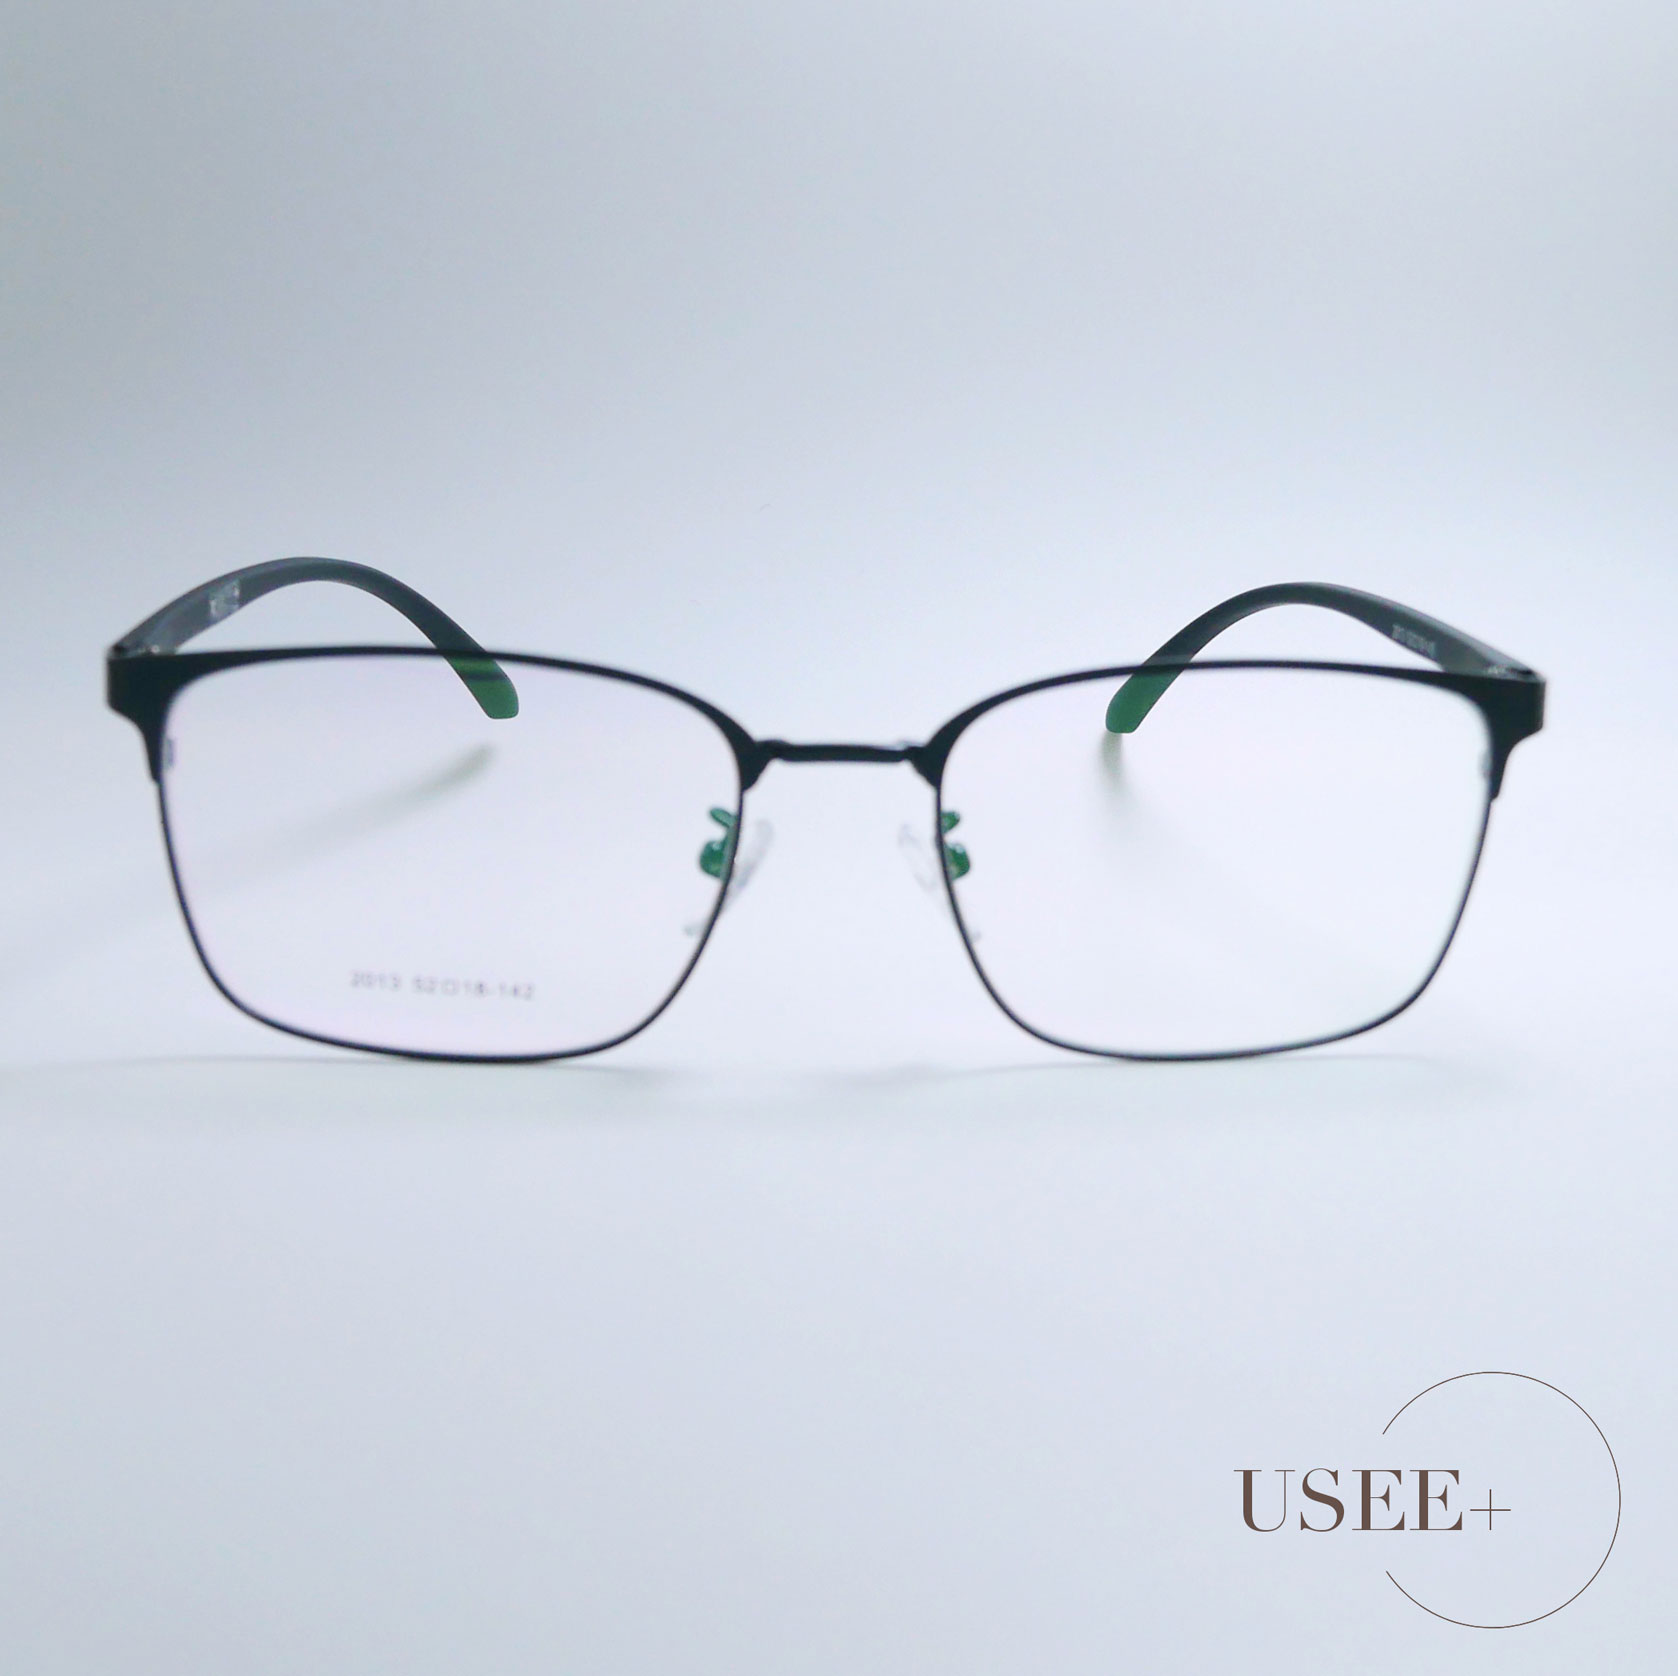 USEE+ 有晰眼镜商务潮流光学眼镜